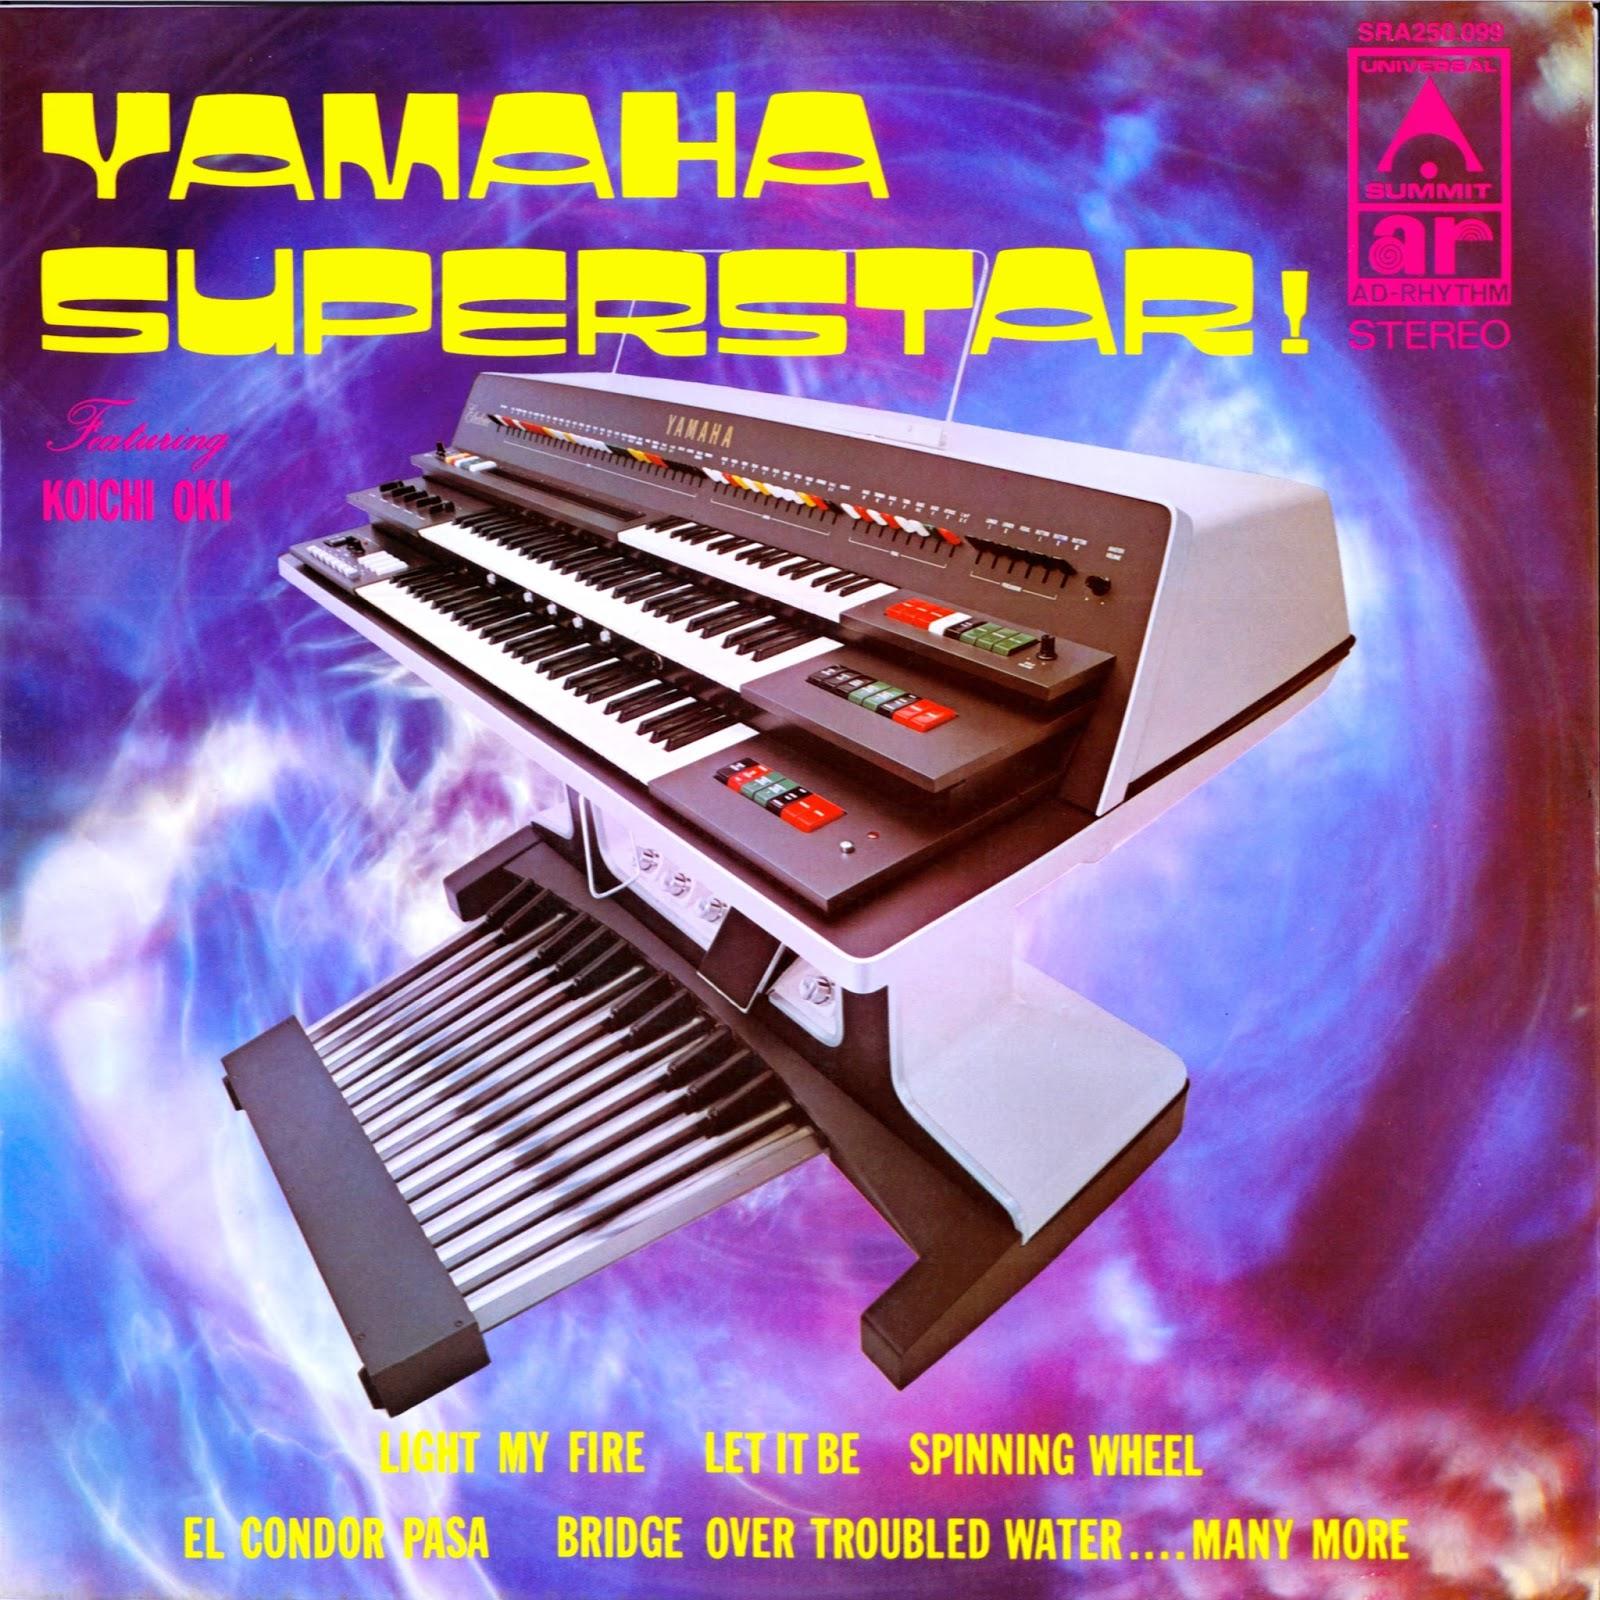 Koichi Oki Yamaha Superstar